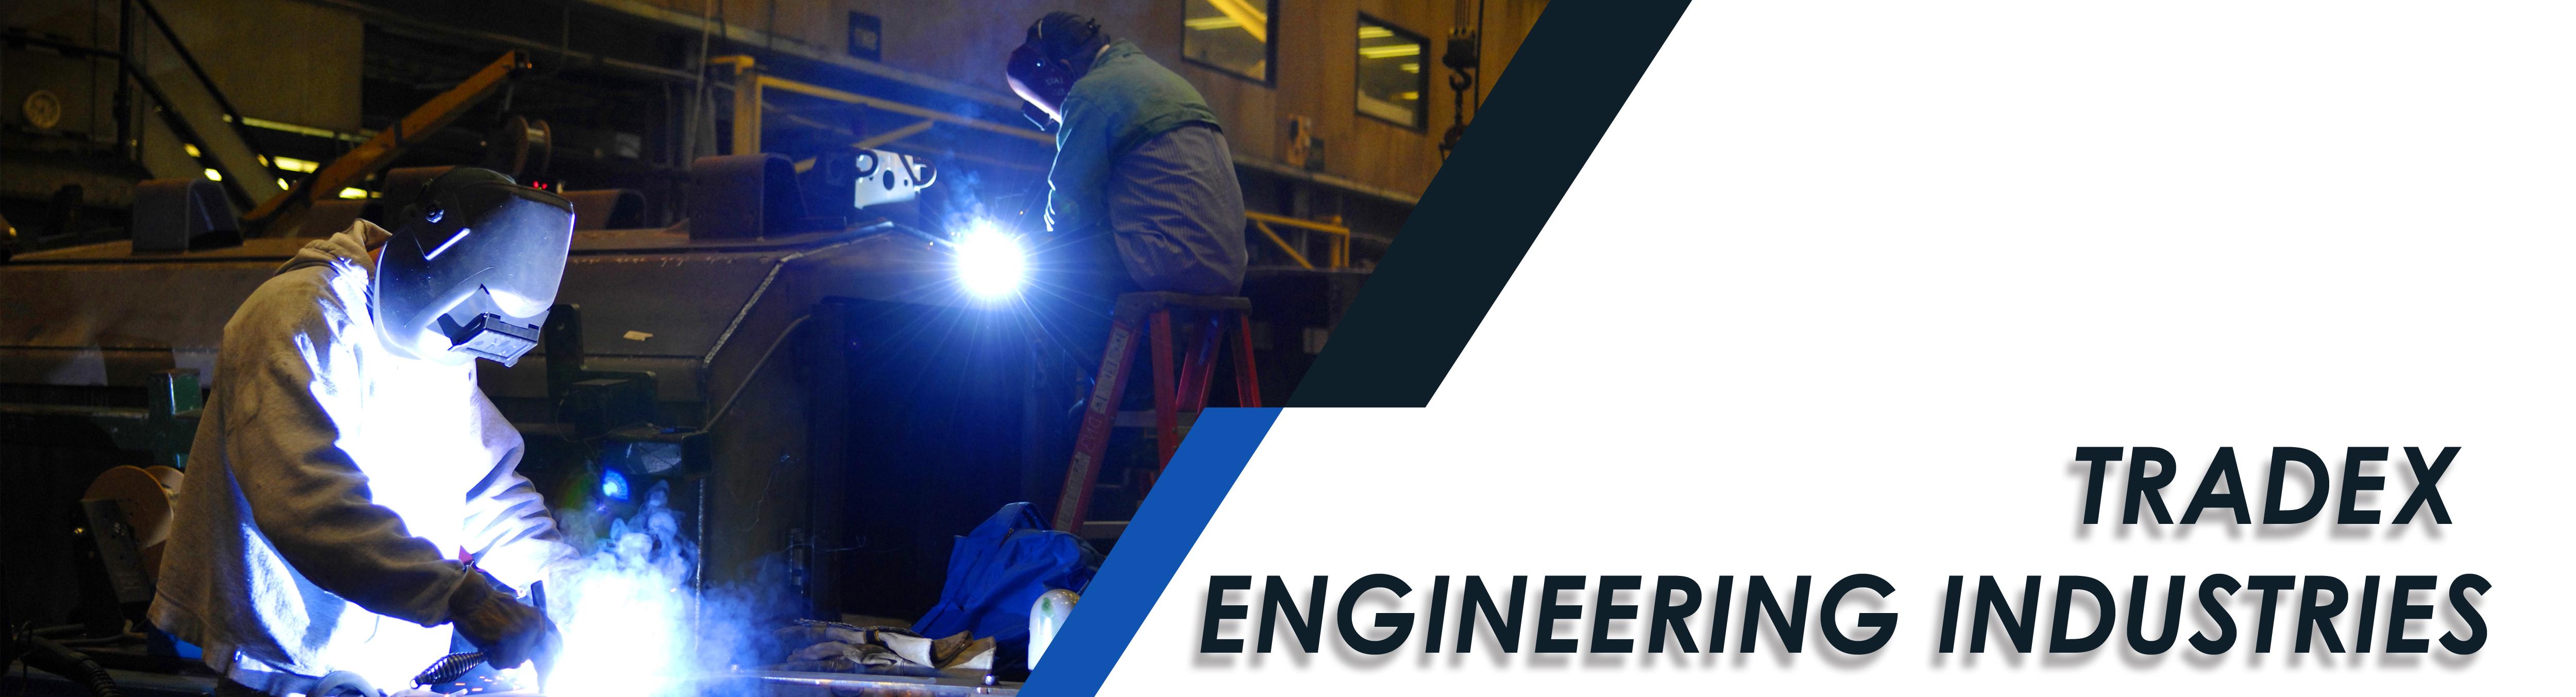 Tradex Engineering Industries